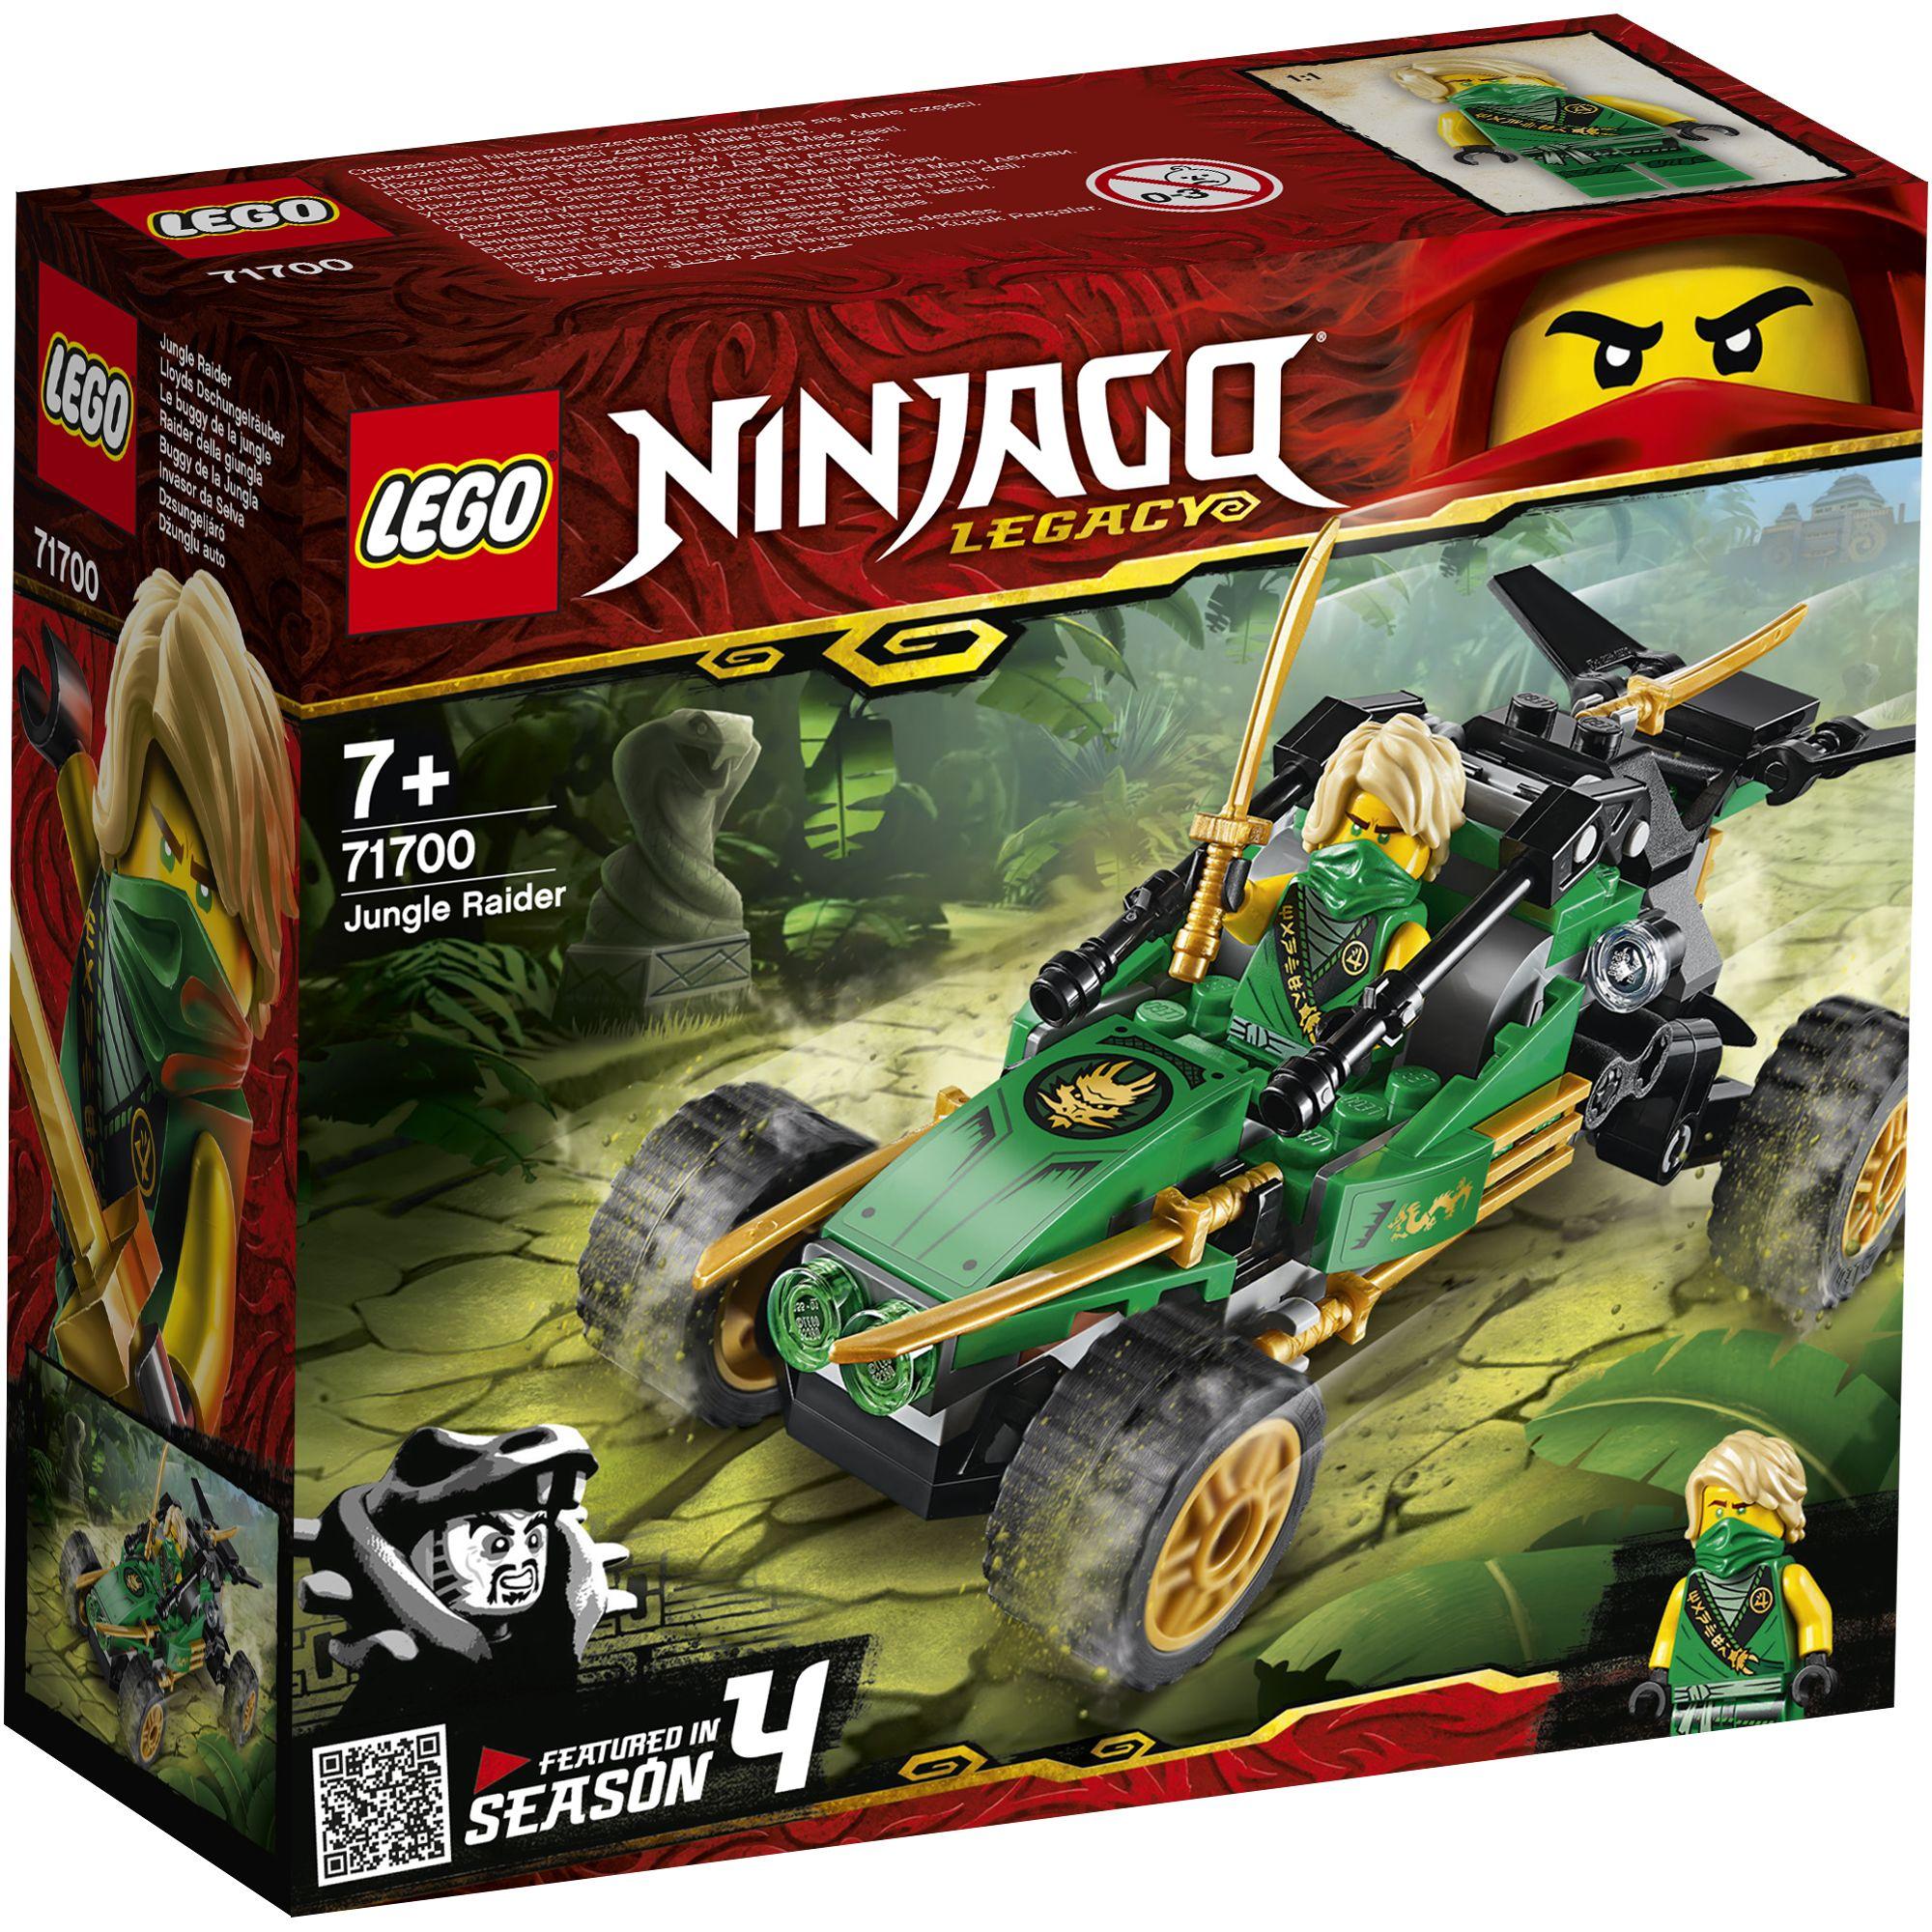 LEGO NINJAGO Fuoristrada della giungla - 71700 LEGO NINJAGO